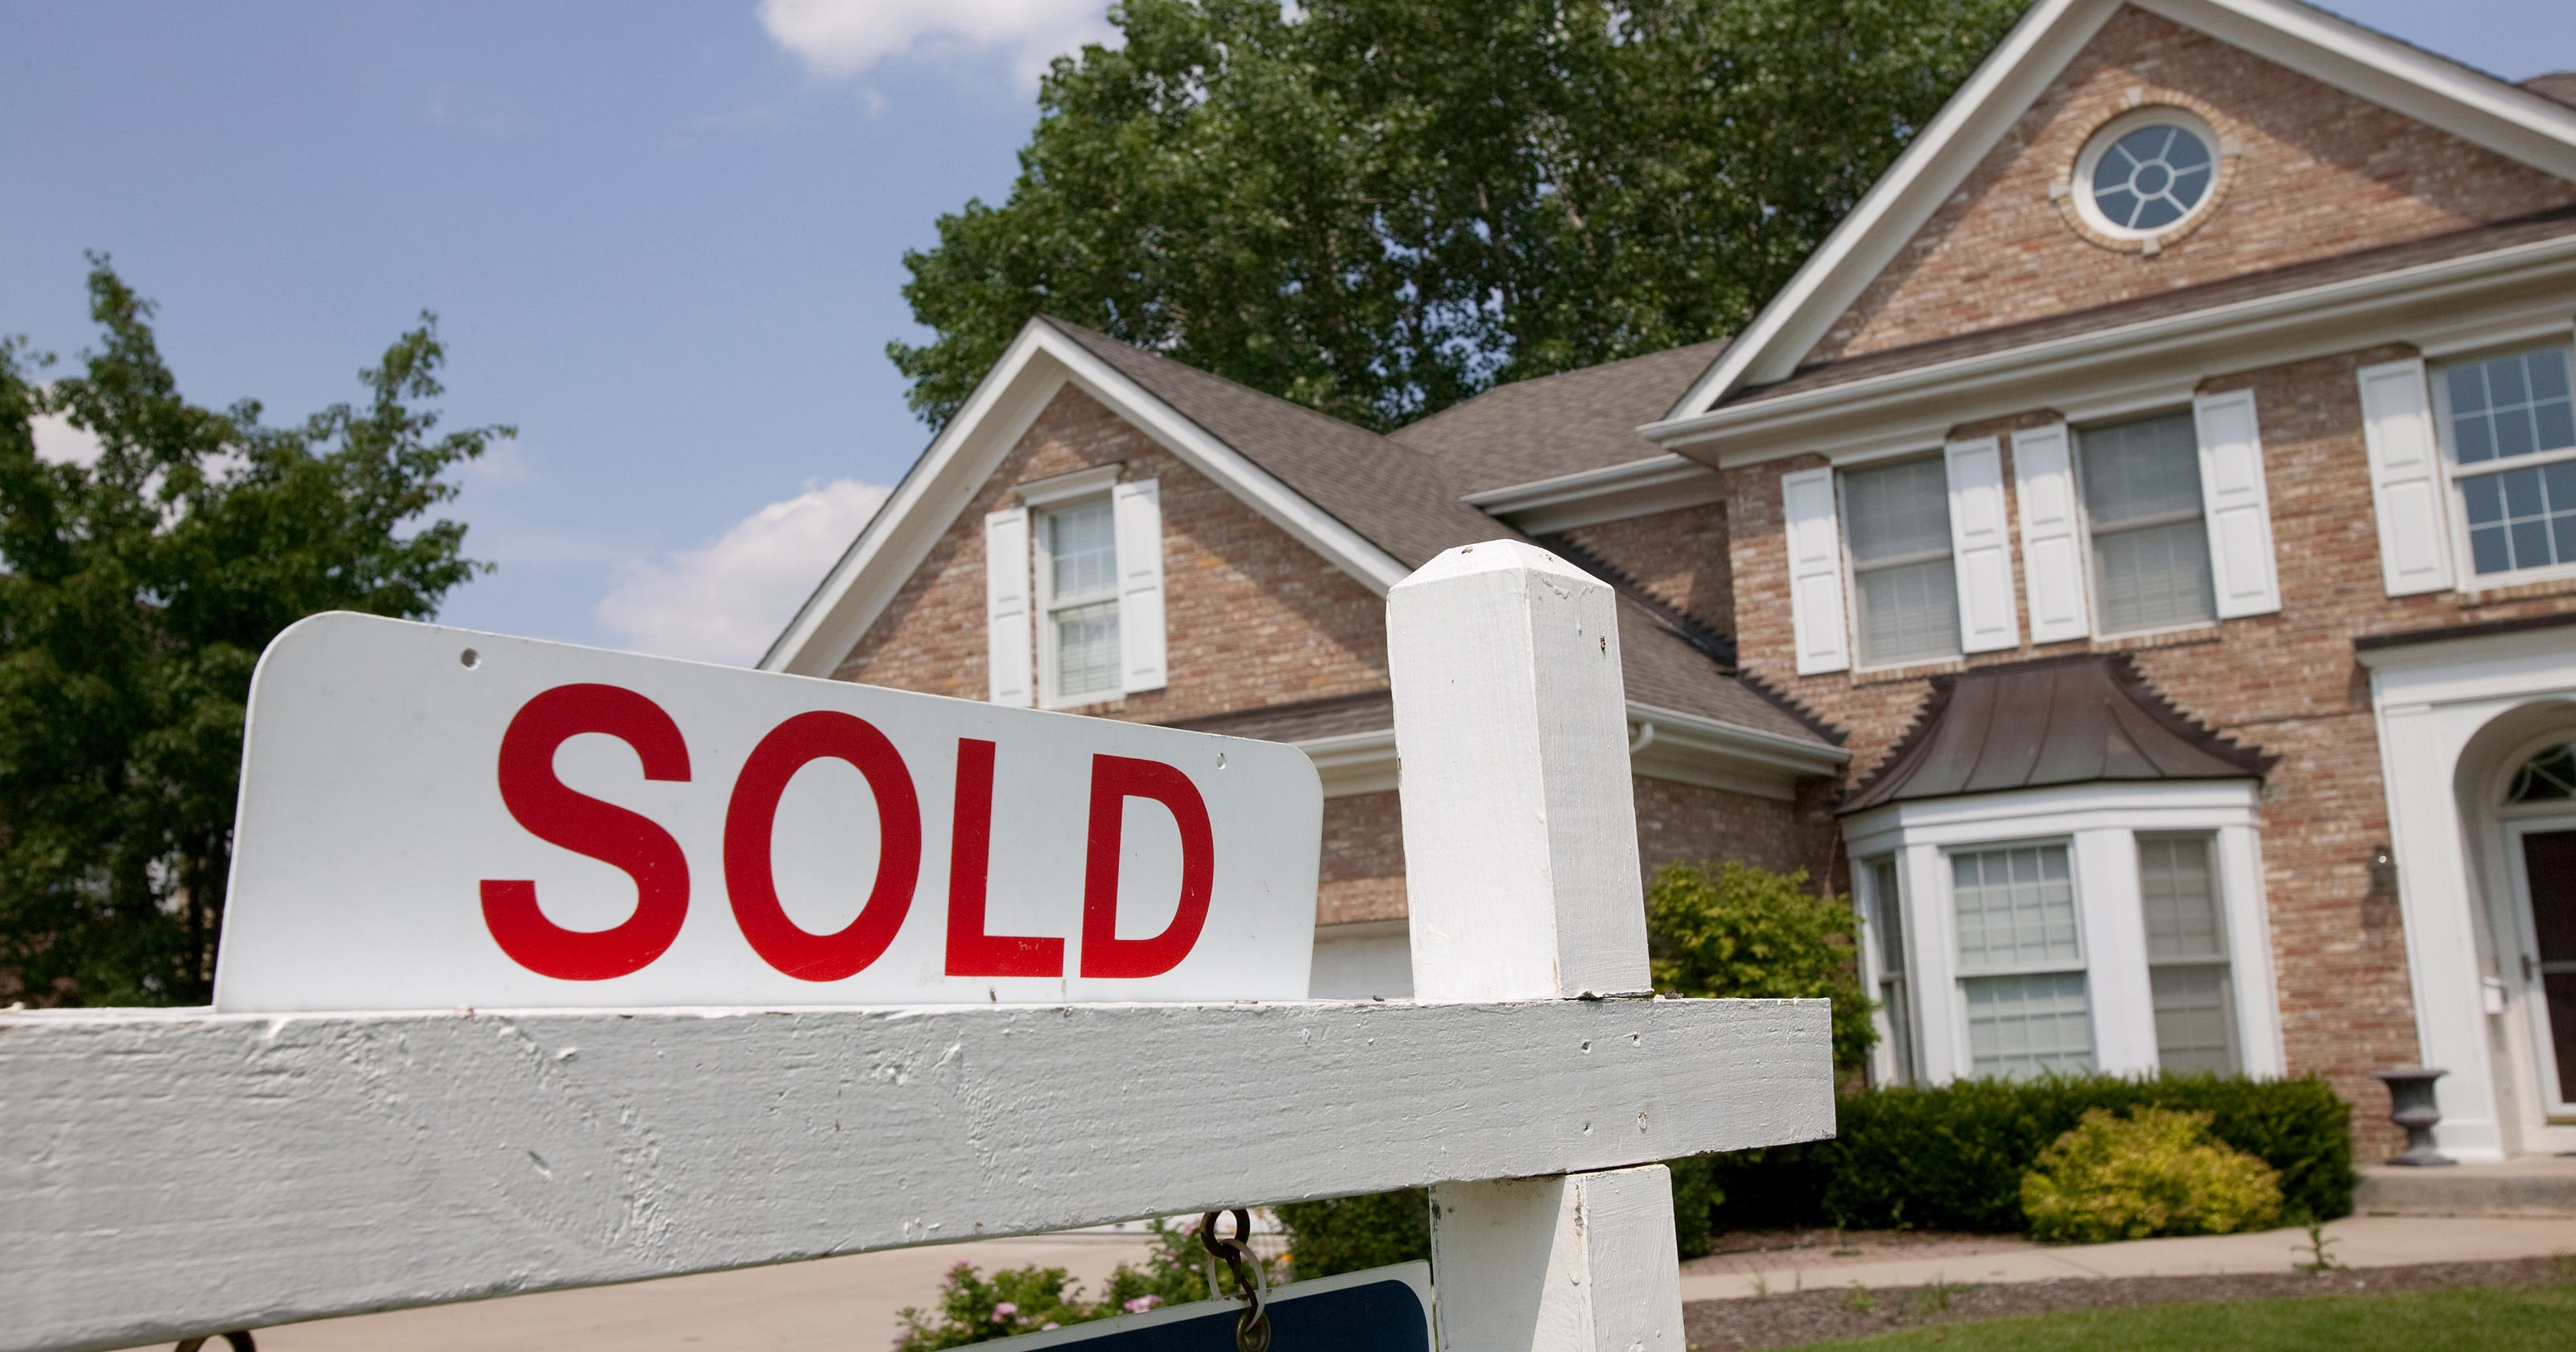 Home buyers sweeten deal by letting sellers stay longer